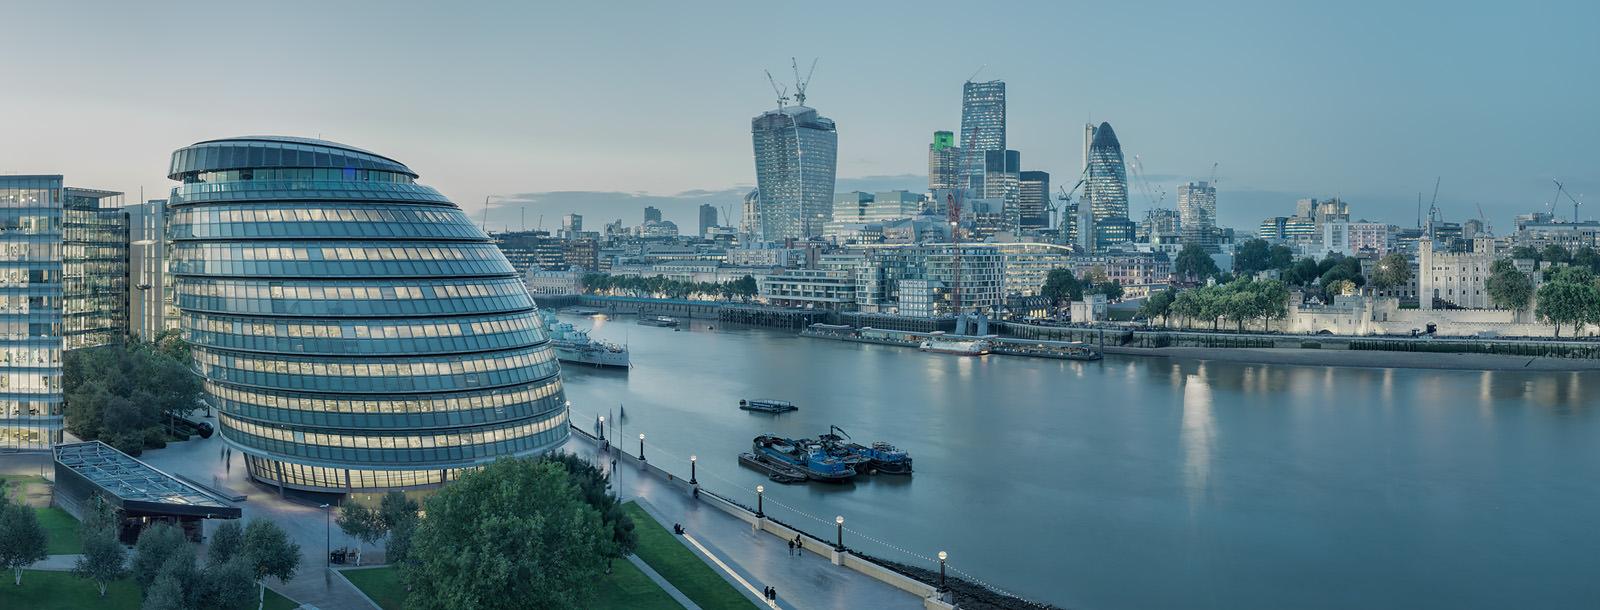 Constant Thames - Acrylic mounted frameless London Fine Art Photo